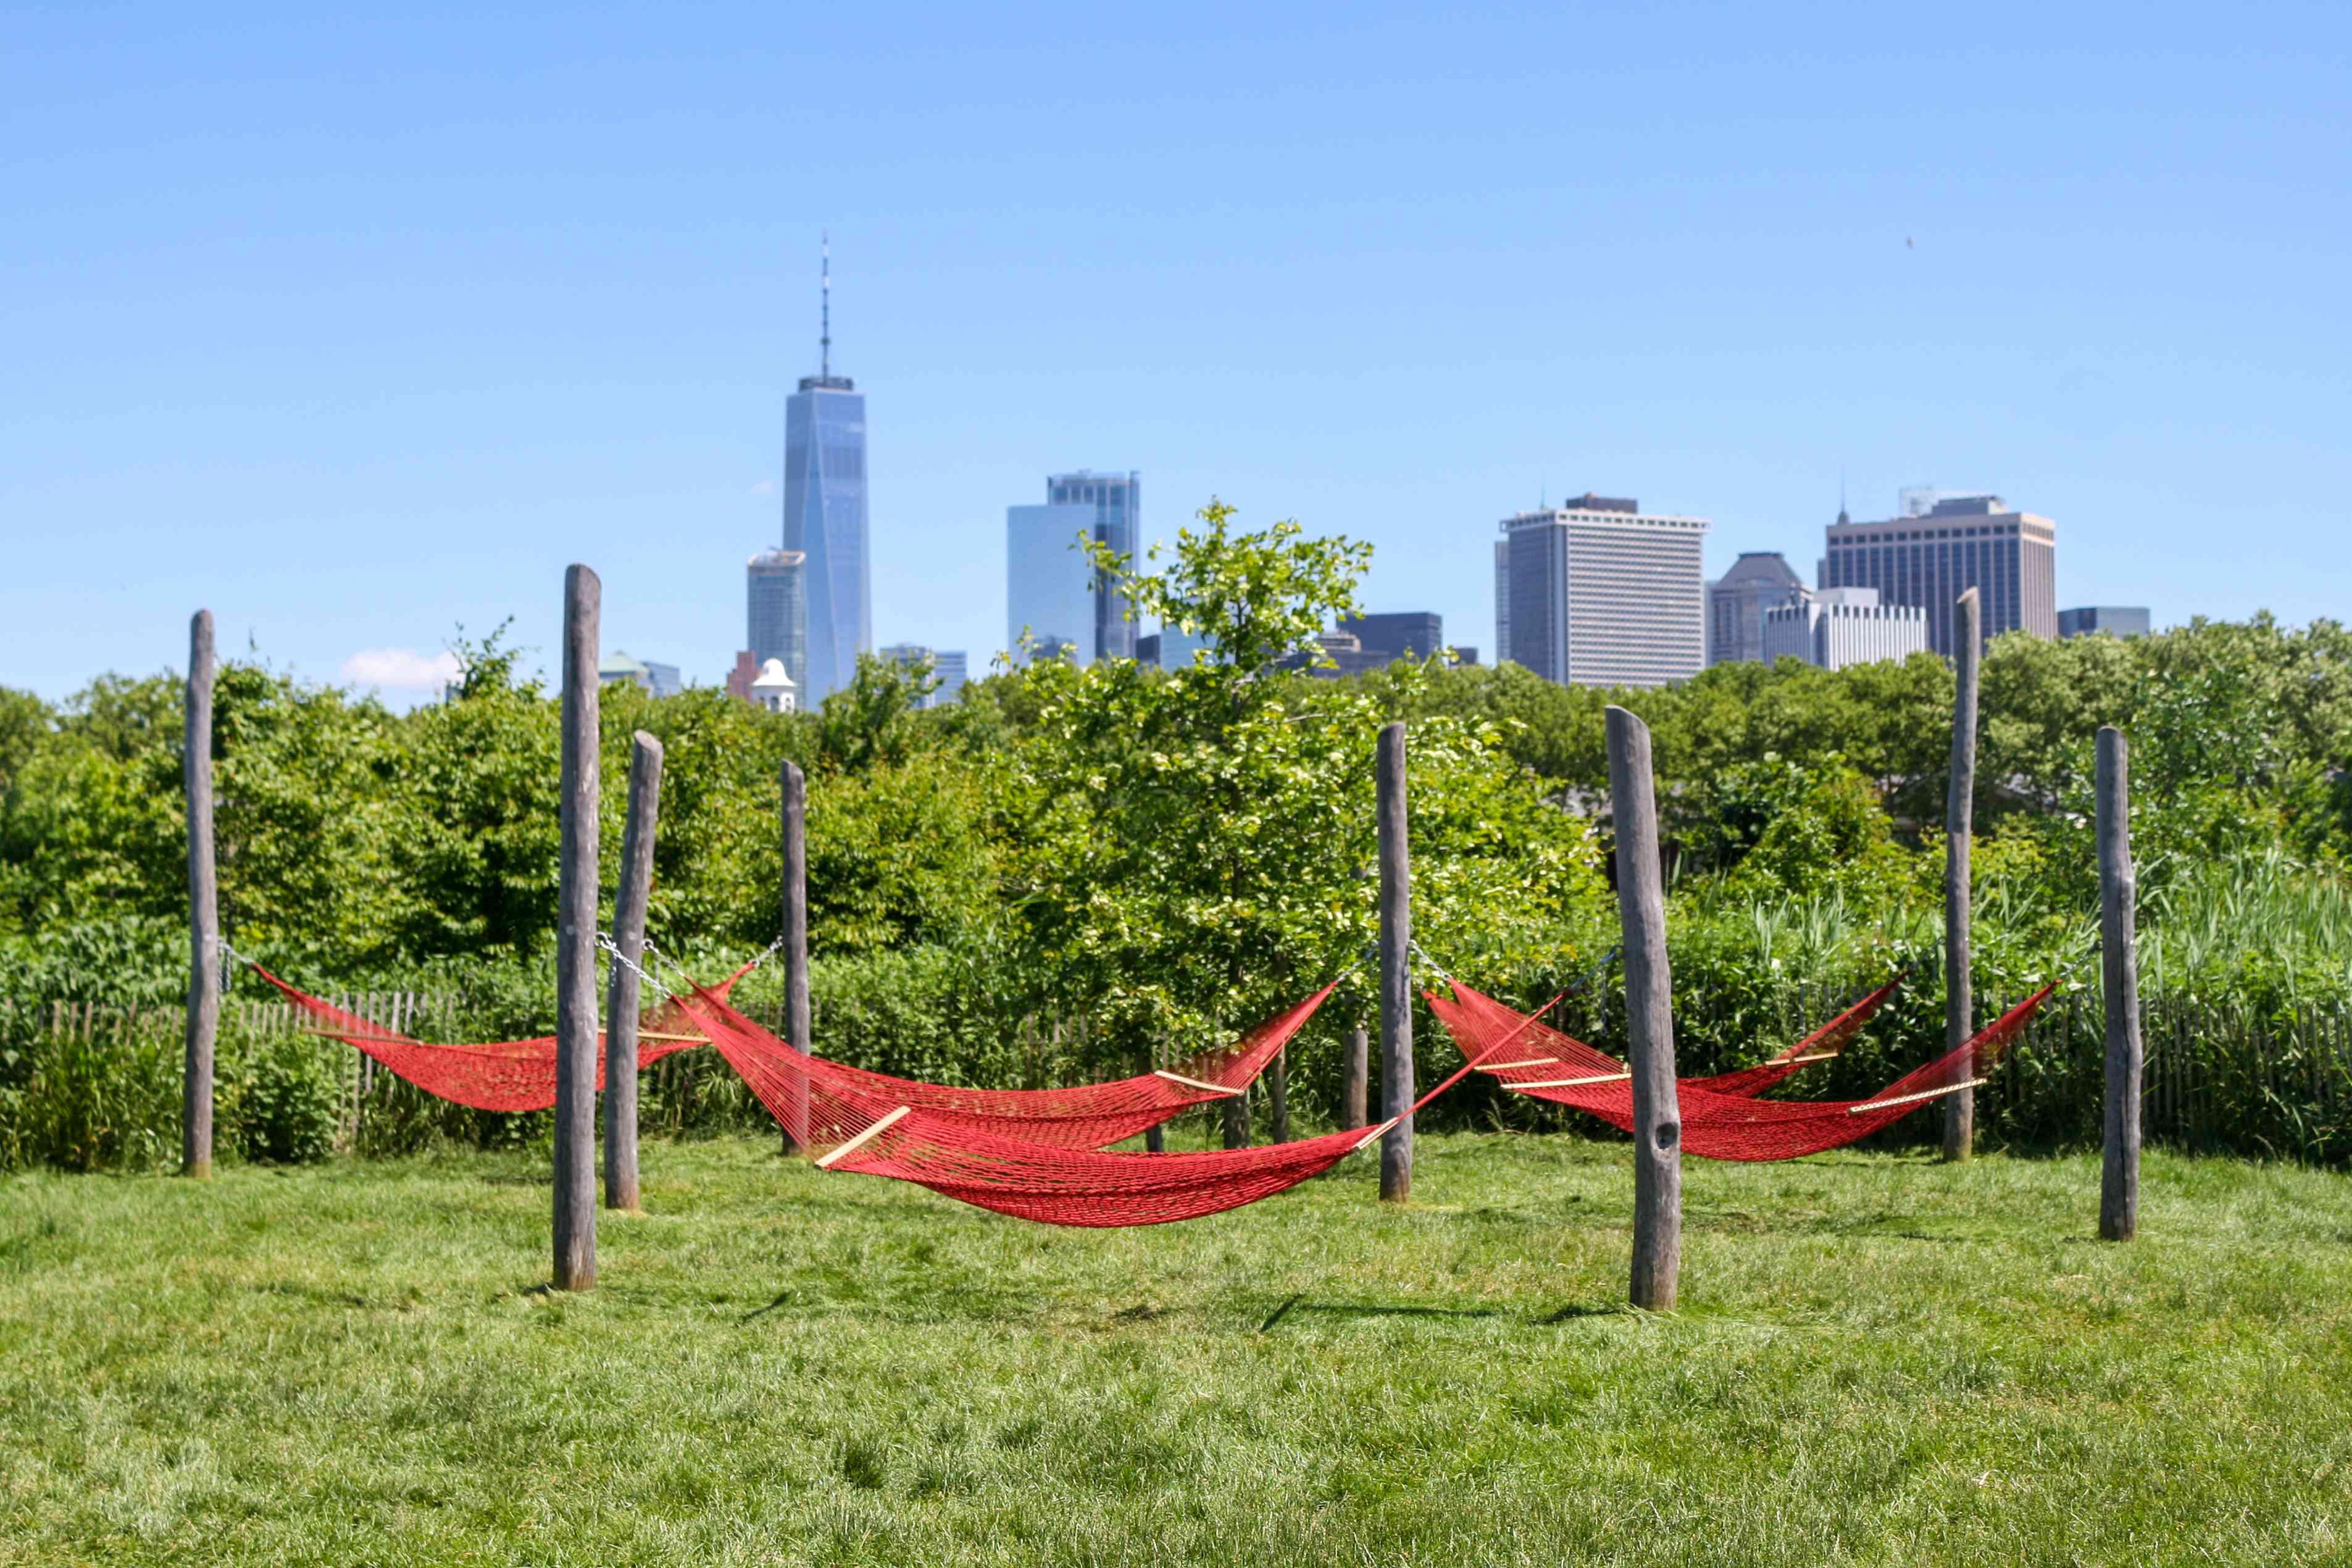 Red hammocks on Governors Island